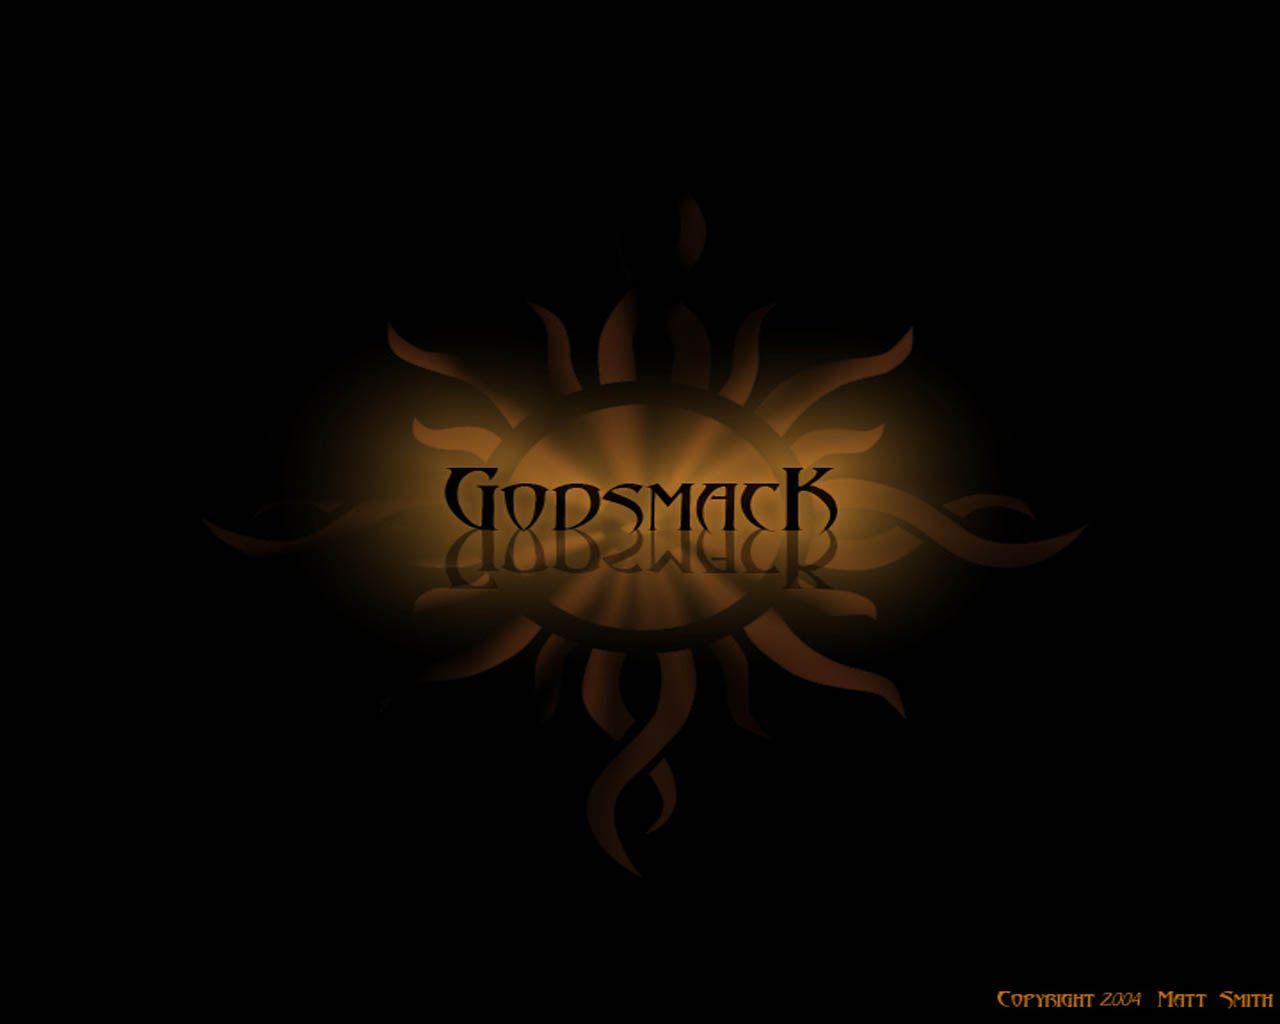 Godsmack Wallpaper Picture Photo Image Sully Erna Photo Music Art